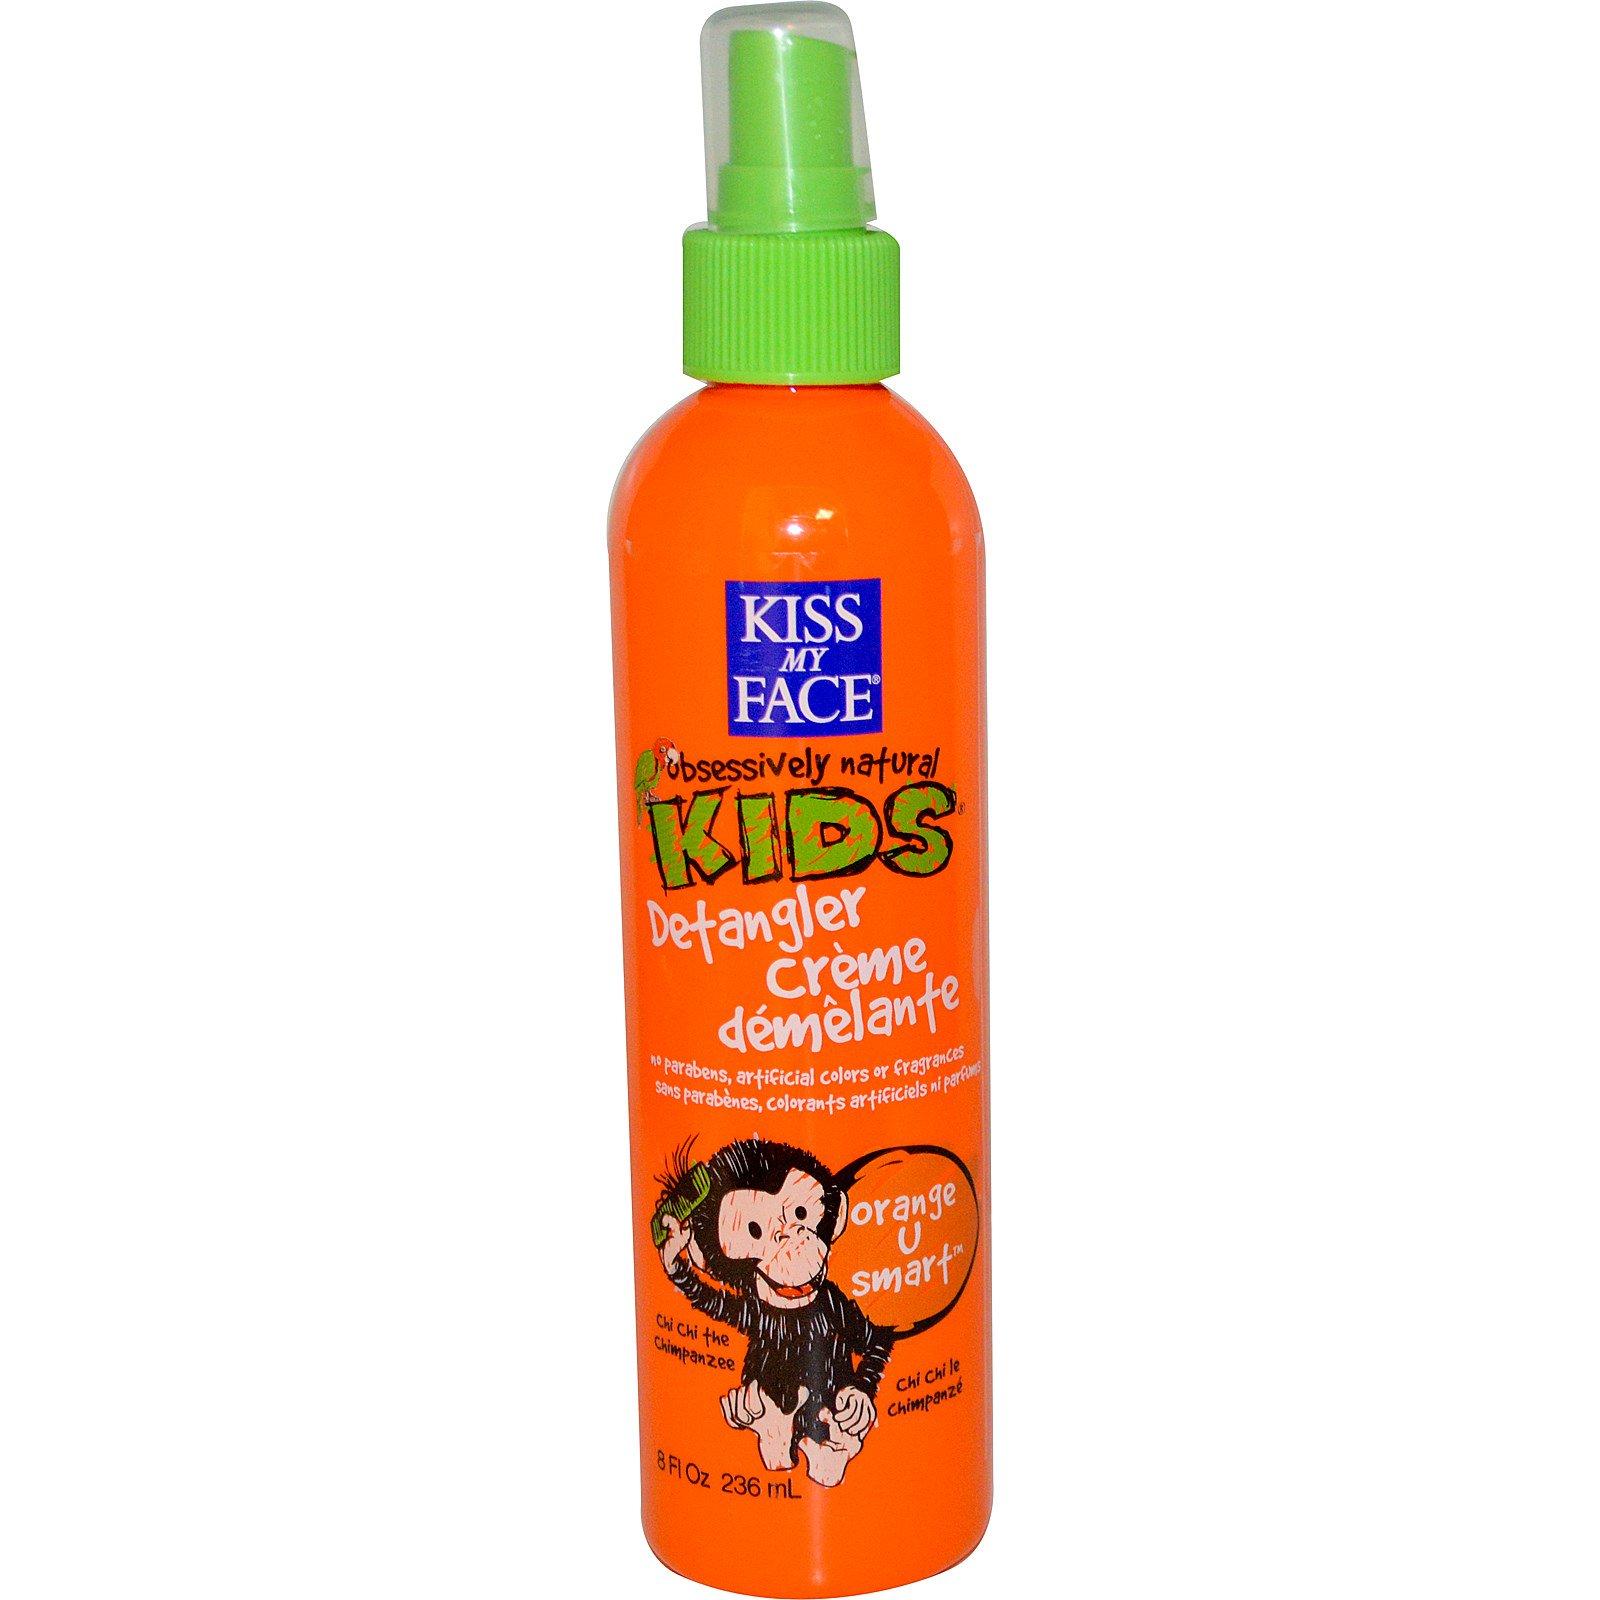 Kiss My Face, Детский кондиционер Obsessively Natural Kids от спутывания волос, аромат апельсина, 236 мл